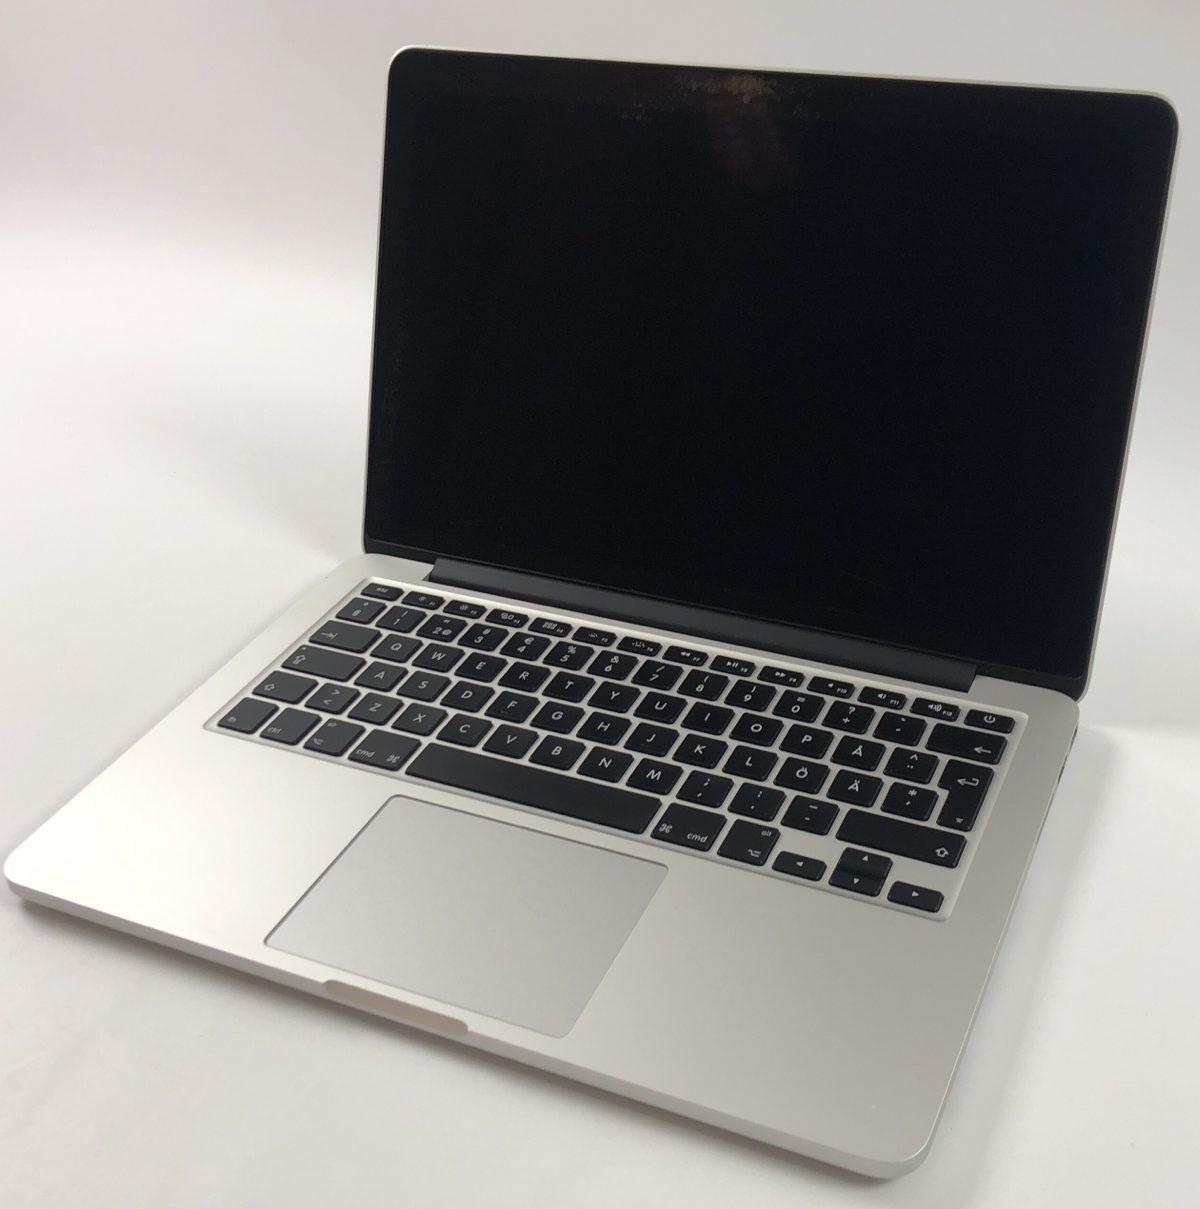 "MacBook Pro Retina 13"" Early 2015 (Intel Core i5 2.7 GHz 16 GB RAM 256 GB SSD), Intel Core i5 2.7 GHz, 16 GB RAM, 256 GB SSD, image 1"